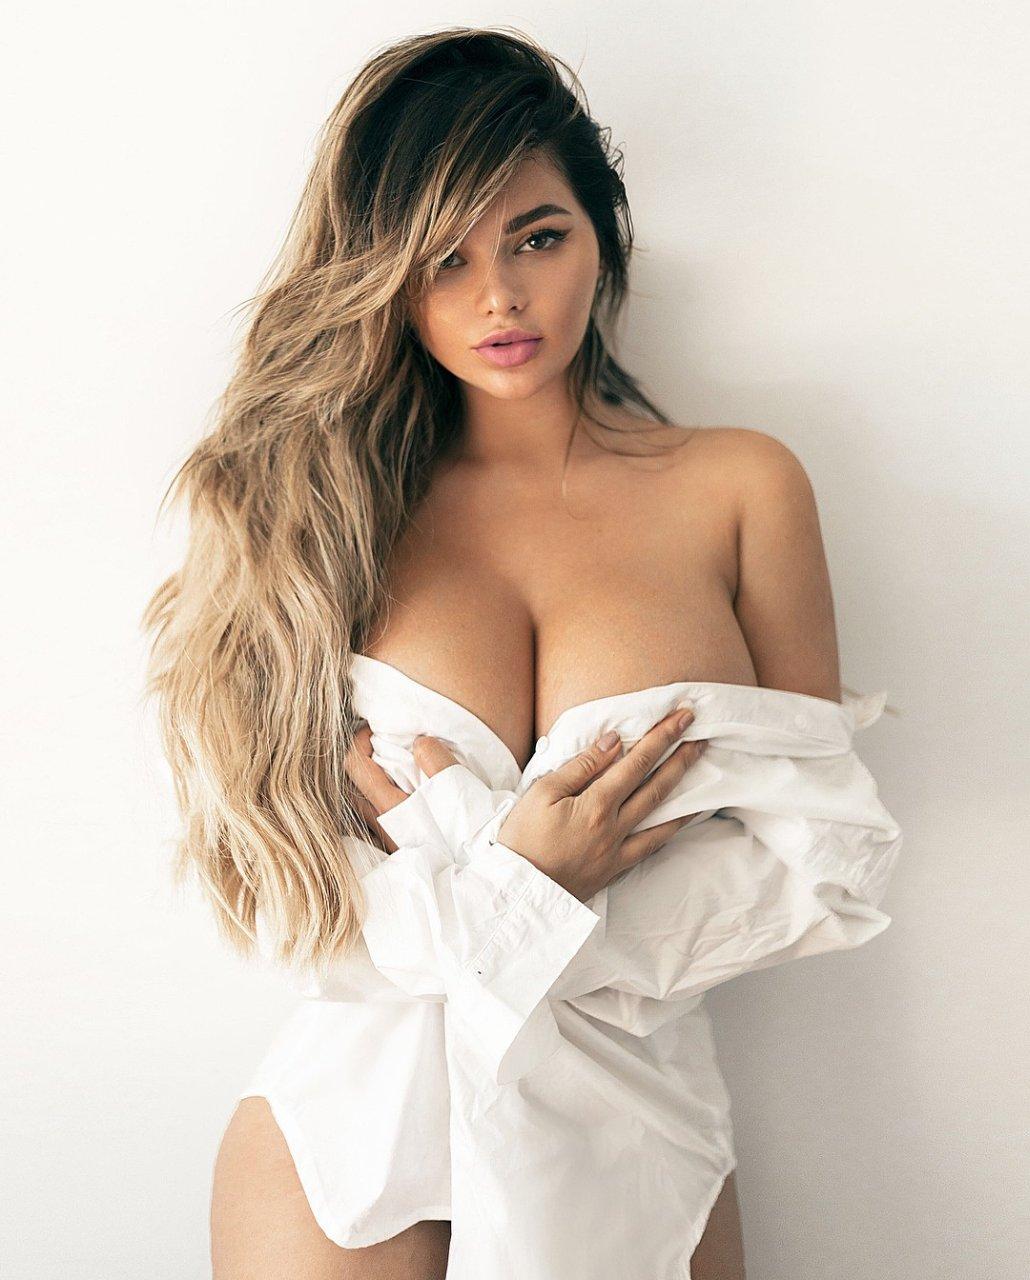 Anastasia pics